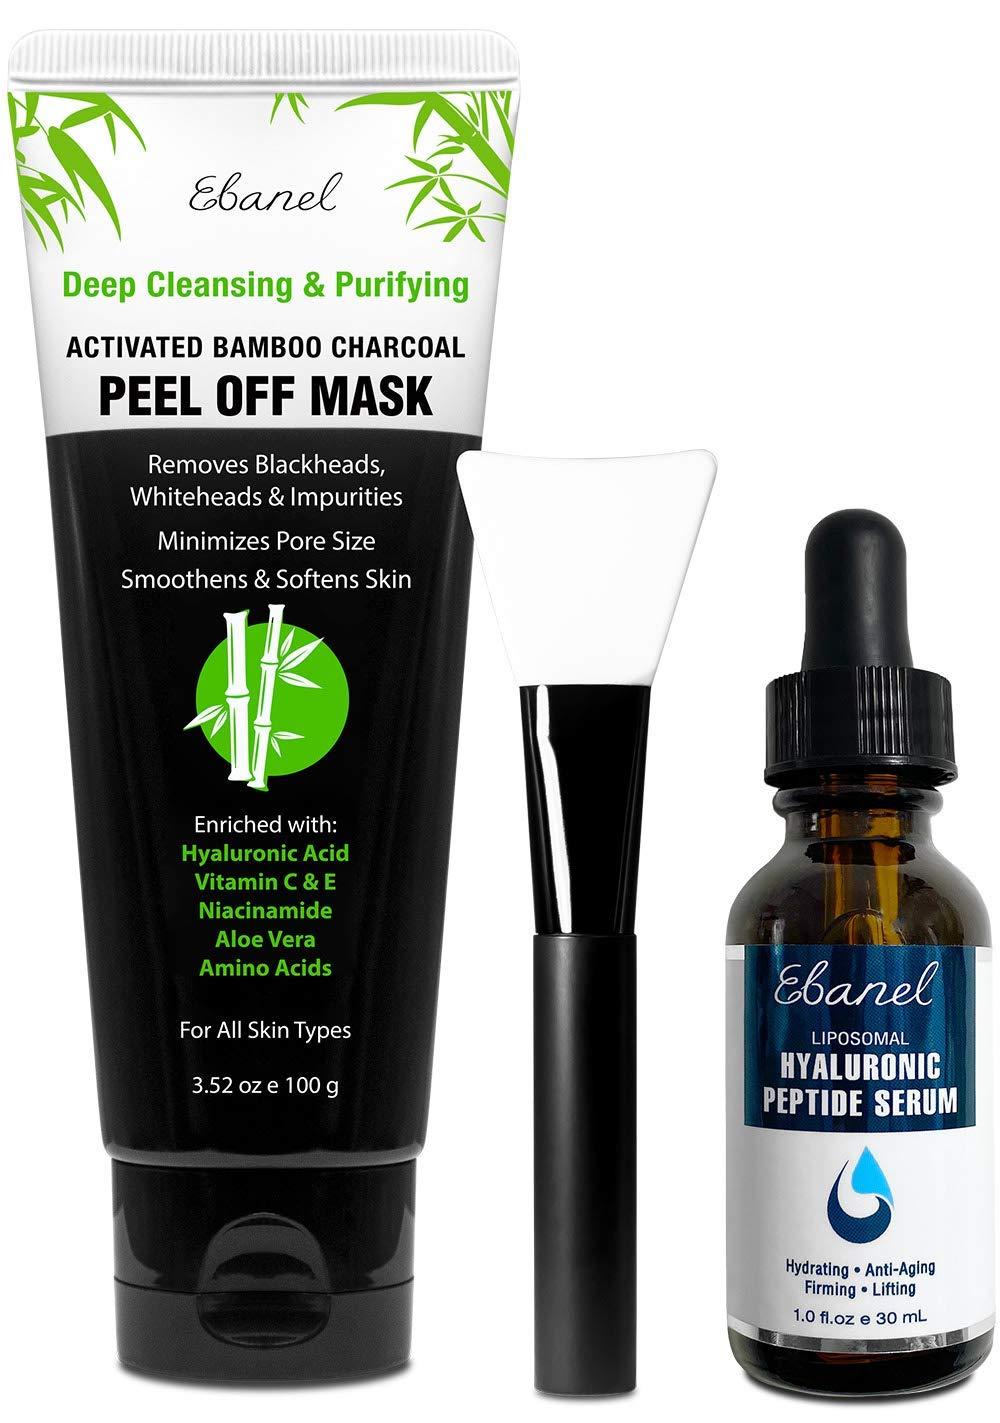 Ebanel Bundle of Charcoal Peel Off Face Mask 3.52 Oz, and Hyaluronic Acid Serum 1 Oz